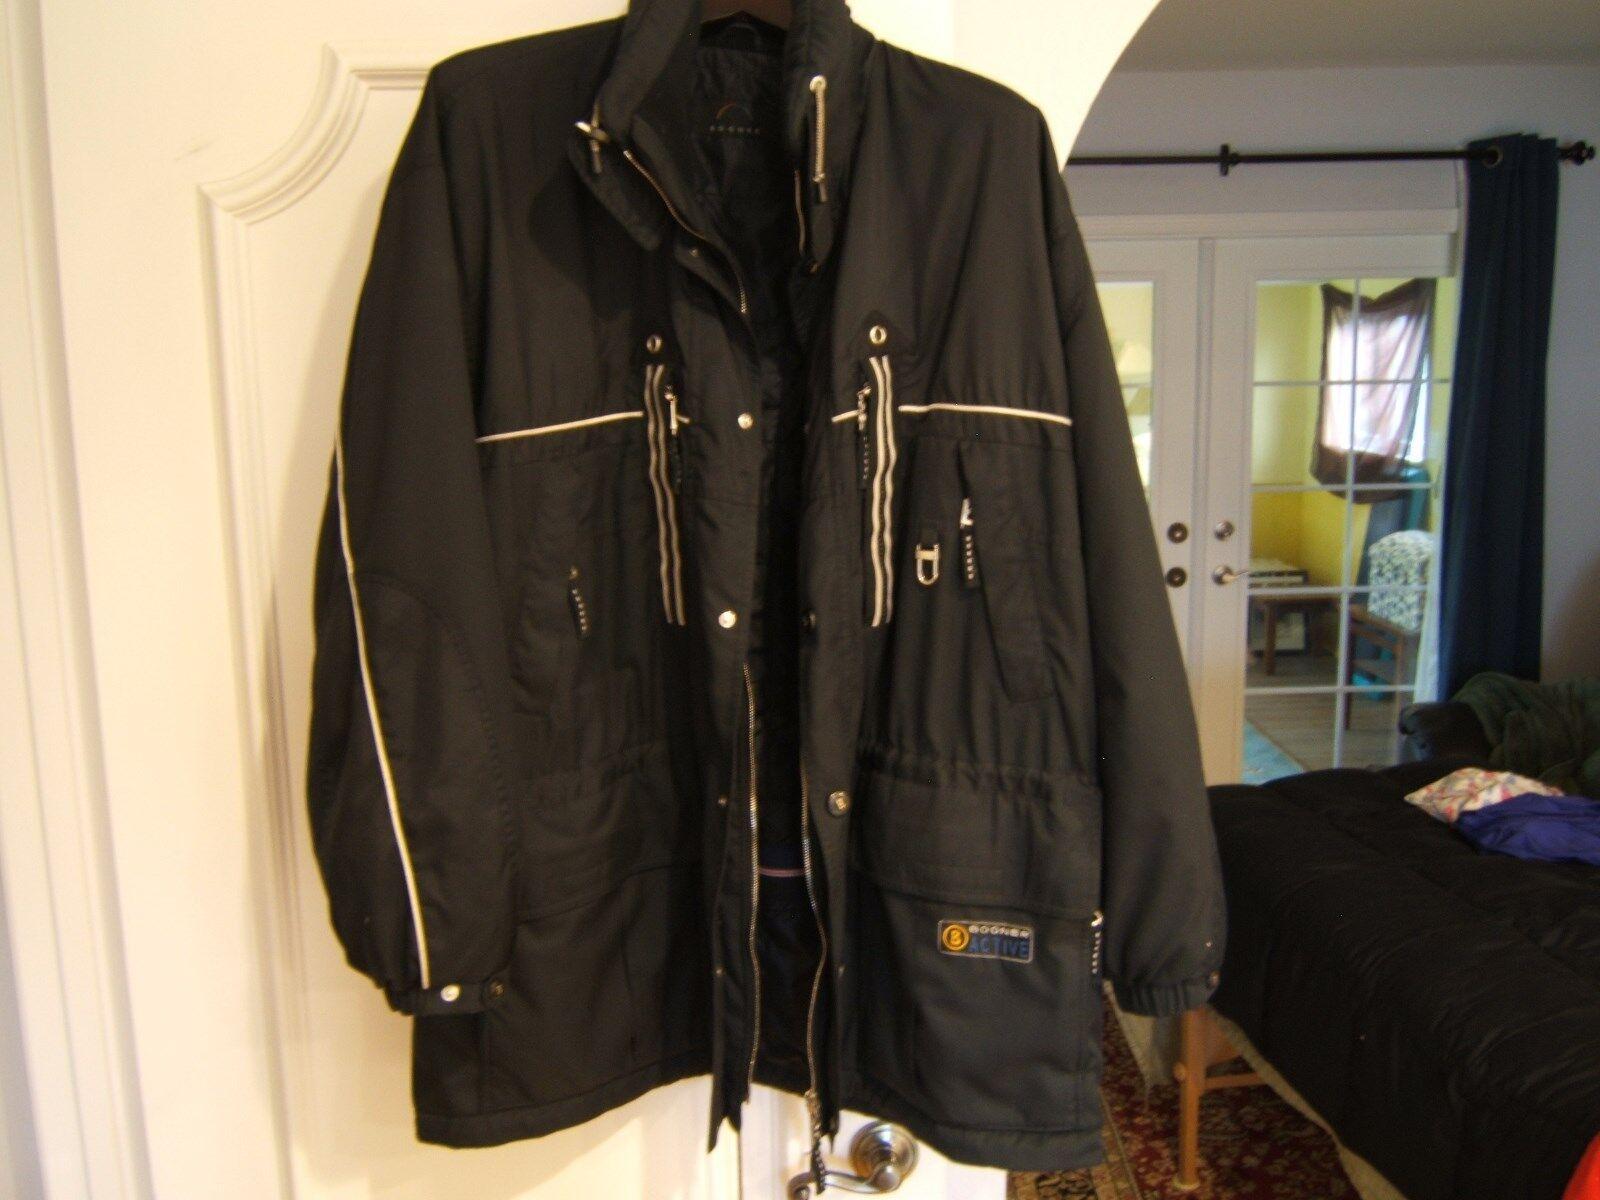 Купить Bogner - Bogner Gorsuch Jacket / coat Men's 46 XL 2XL XXL Goan Thylmann Active with hood